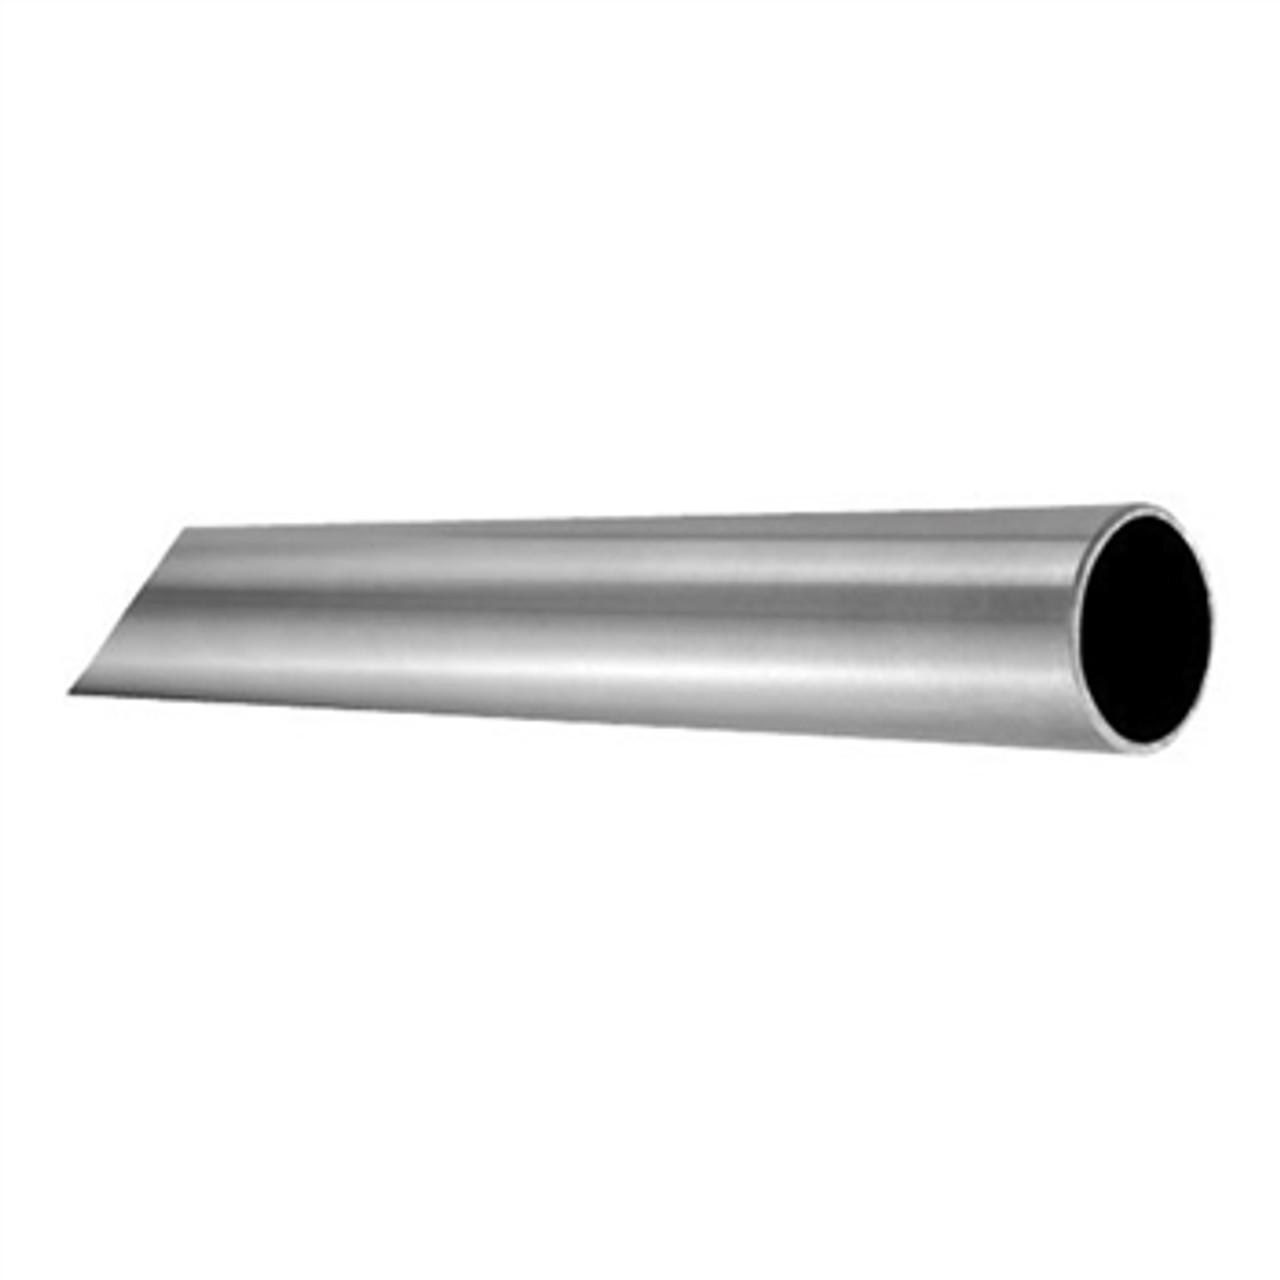 "E0014 Stainless Steel Tube, 2"", 9-foot"